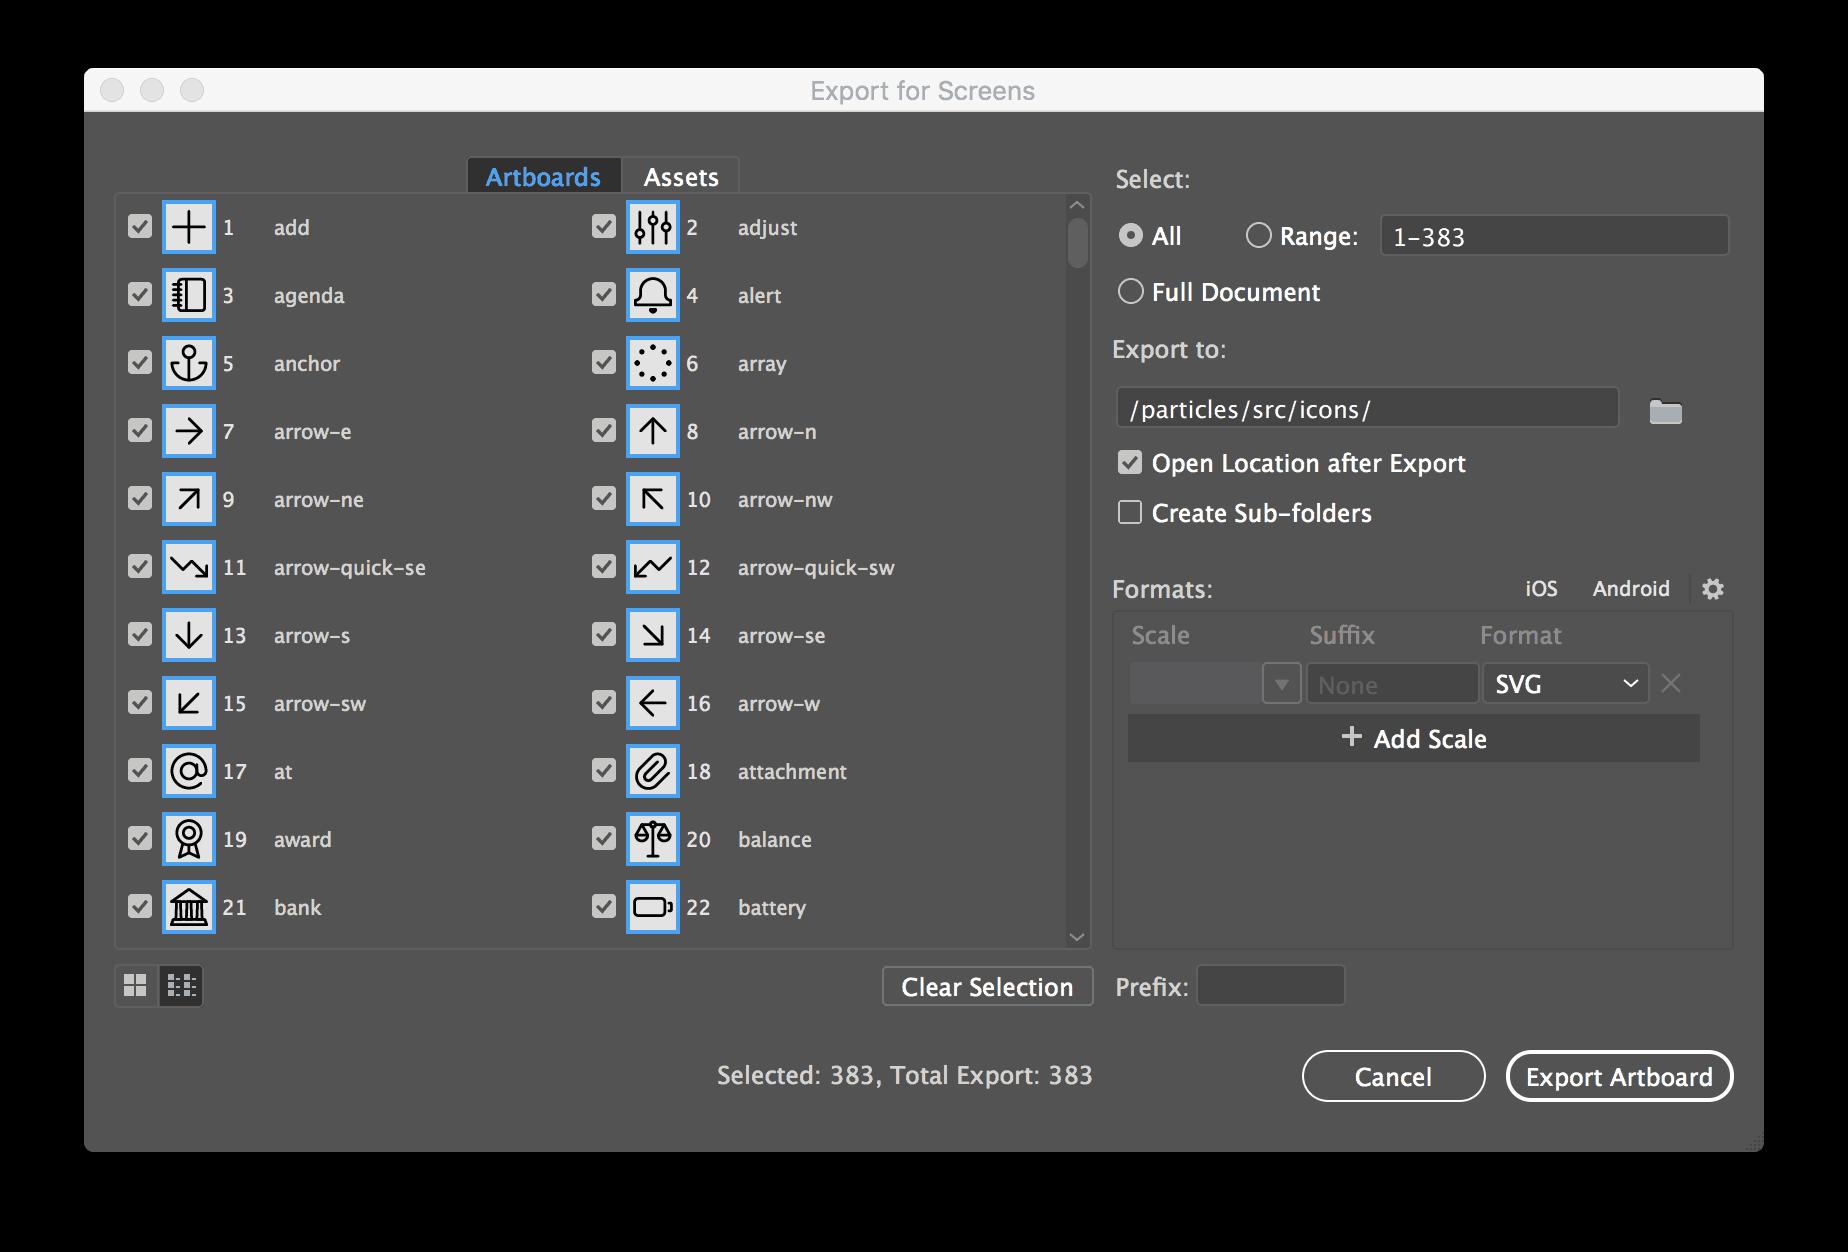 Adobe Illustrator - Export the icon